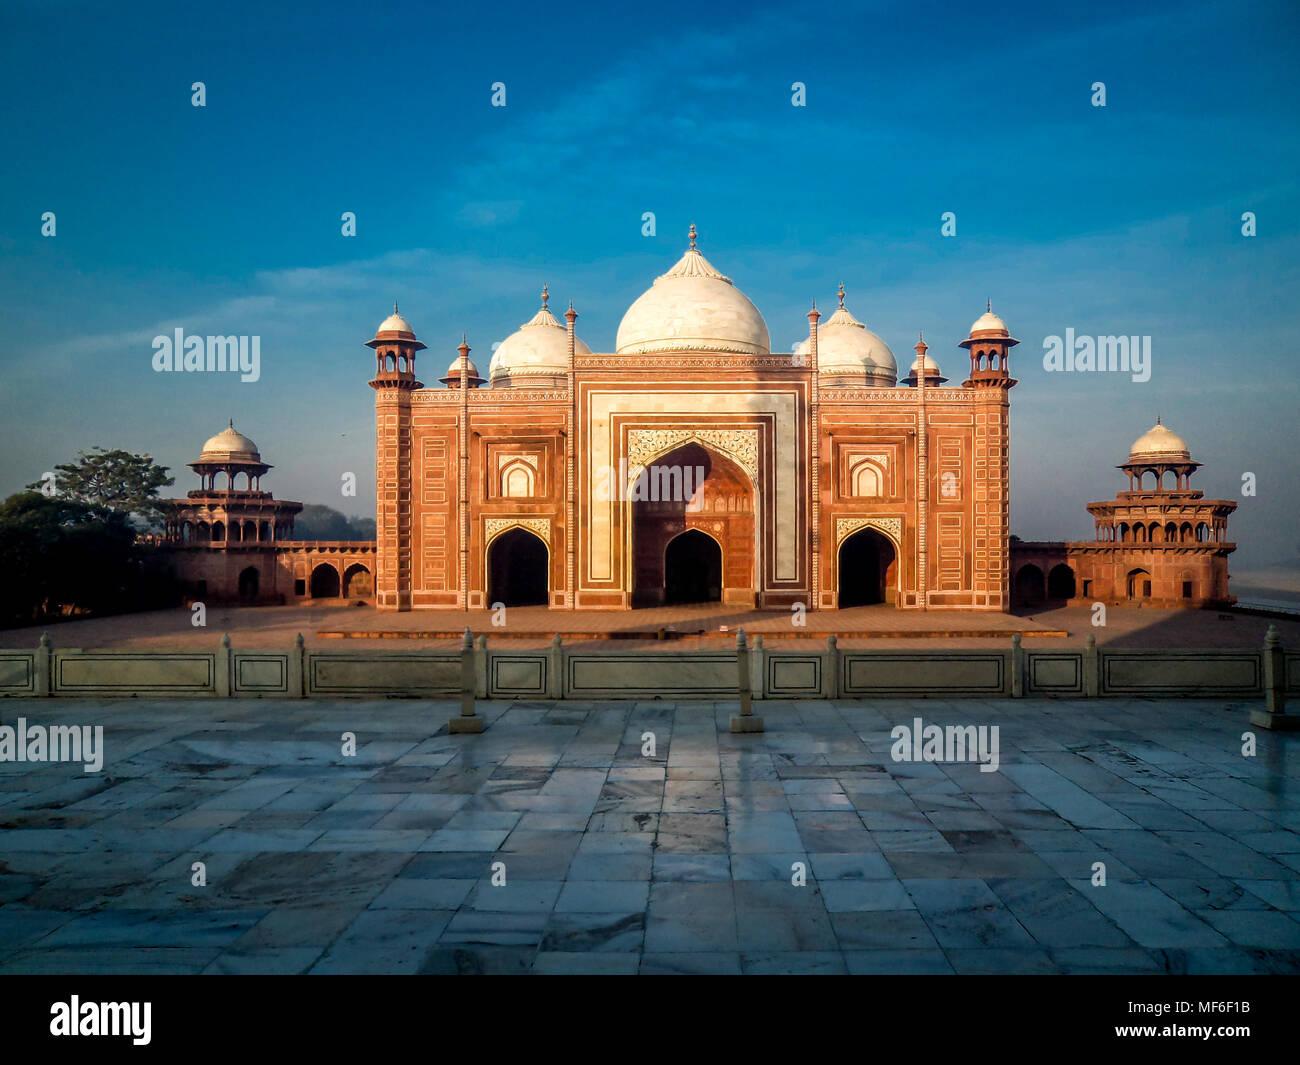 La mezquita en el Taj Mahal, en Agra, India Imagen De Stock